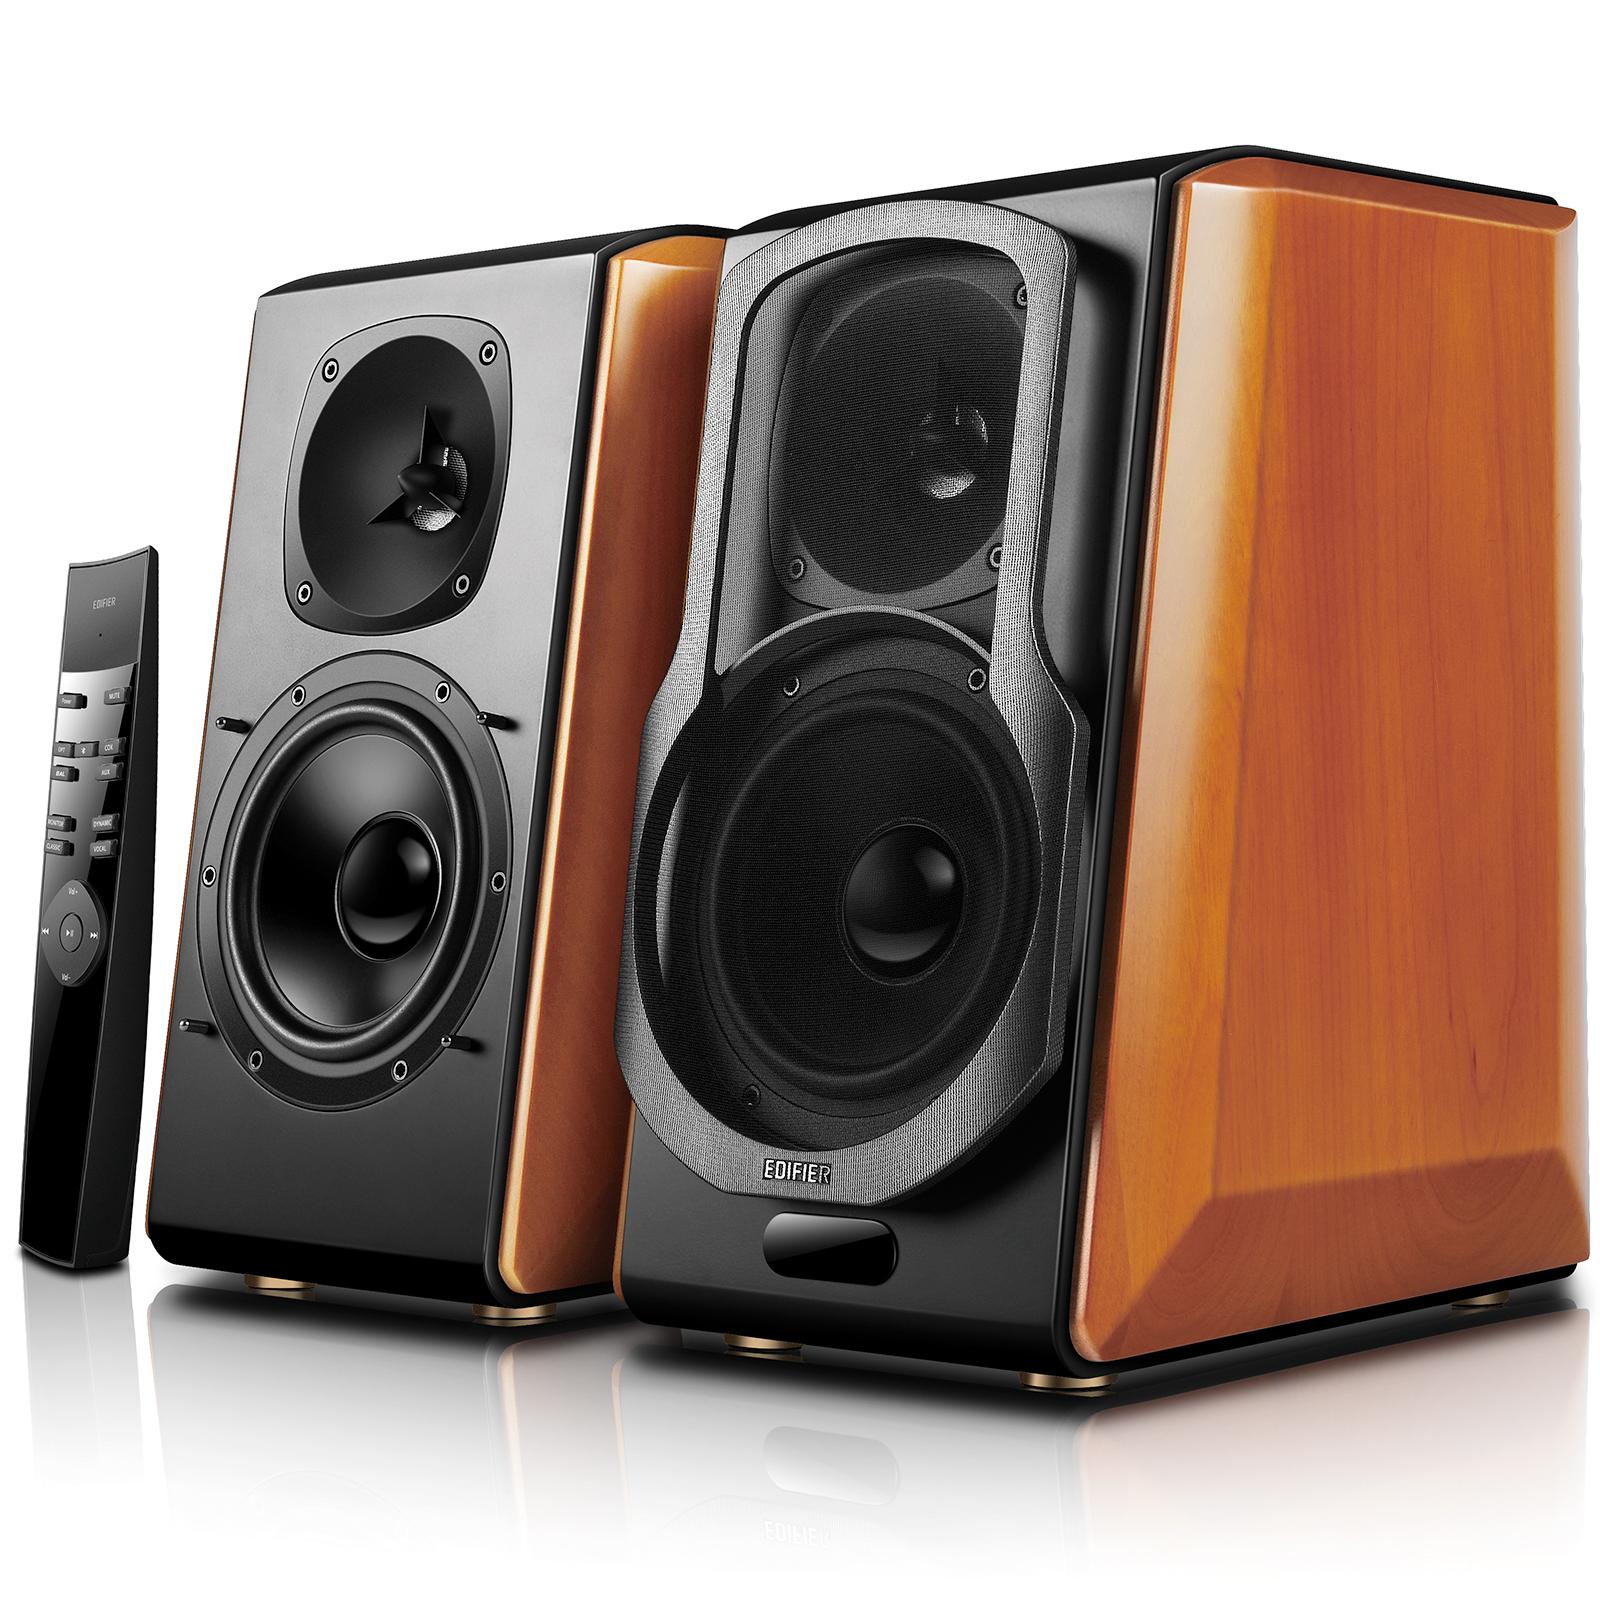 Edifier S2000pro Powered Bluetooth Bookshelf Speakers - Near-Field Active Studio Monitor Speaker with Wireless and Optical Input